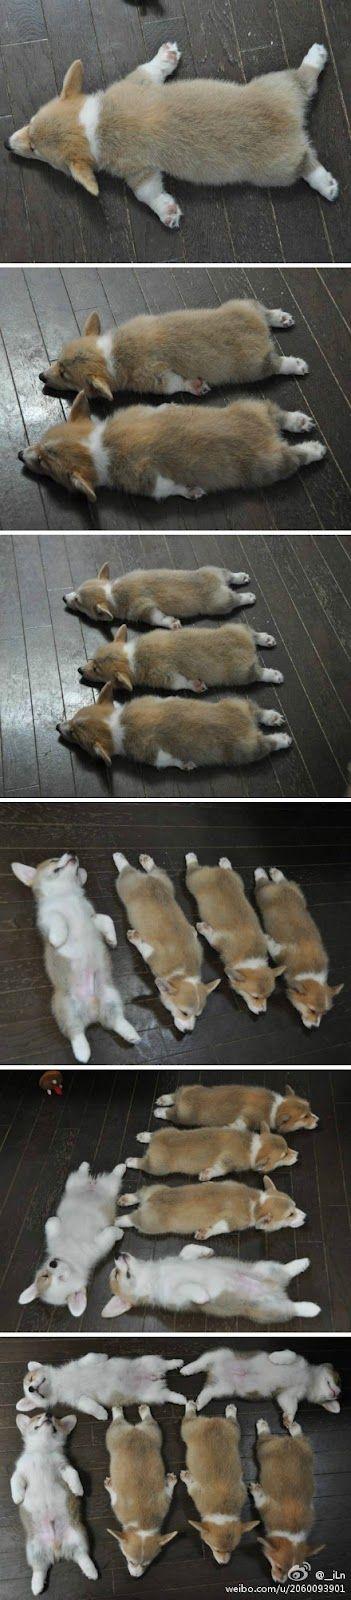 Cute sleeping corgi puppies